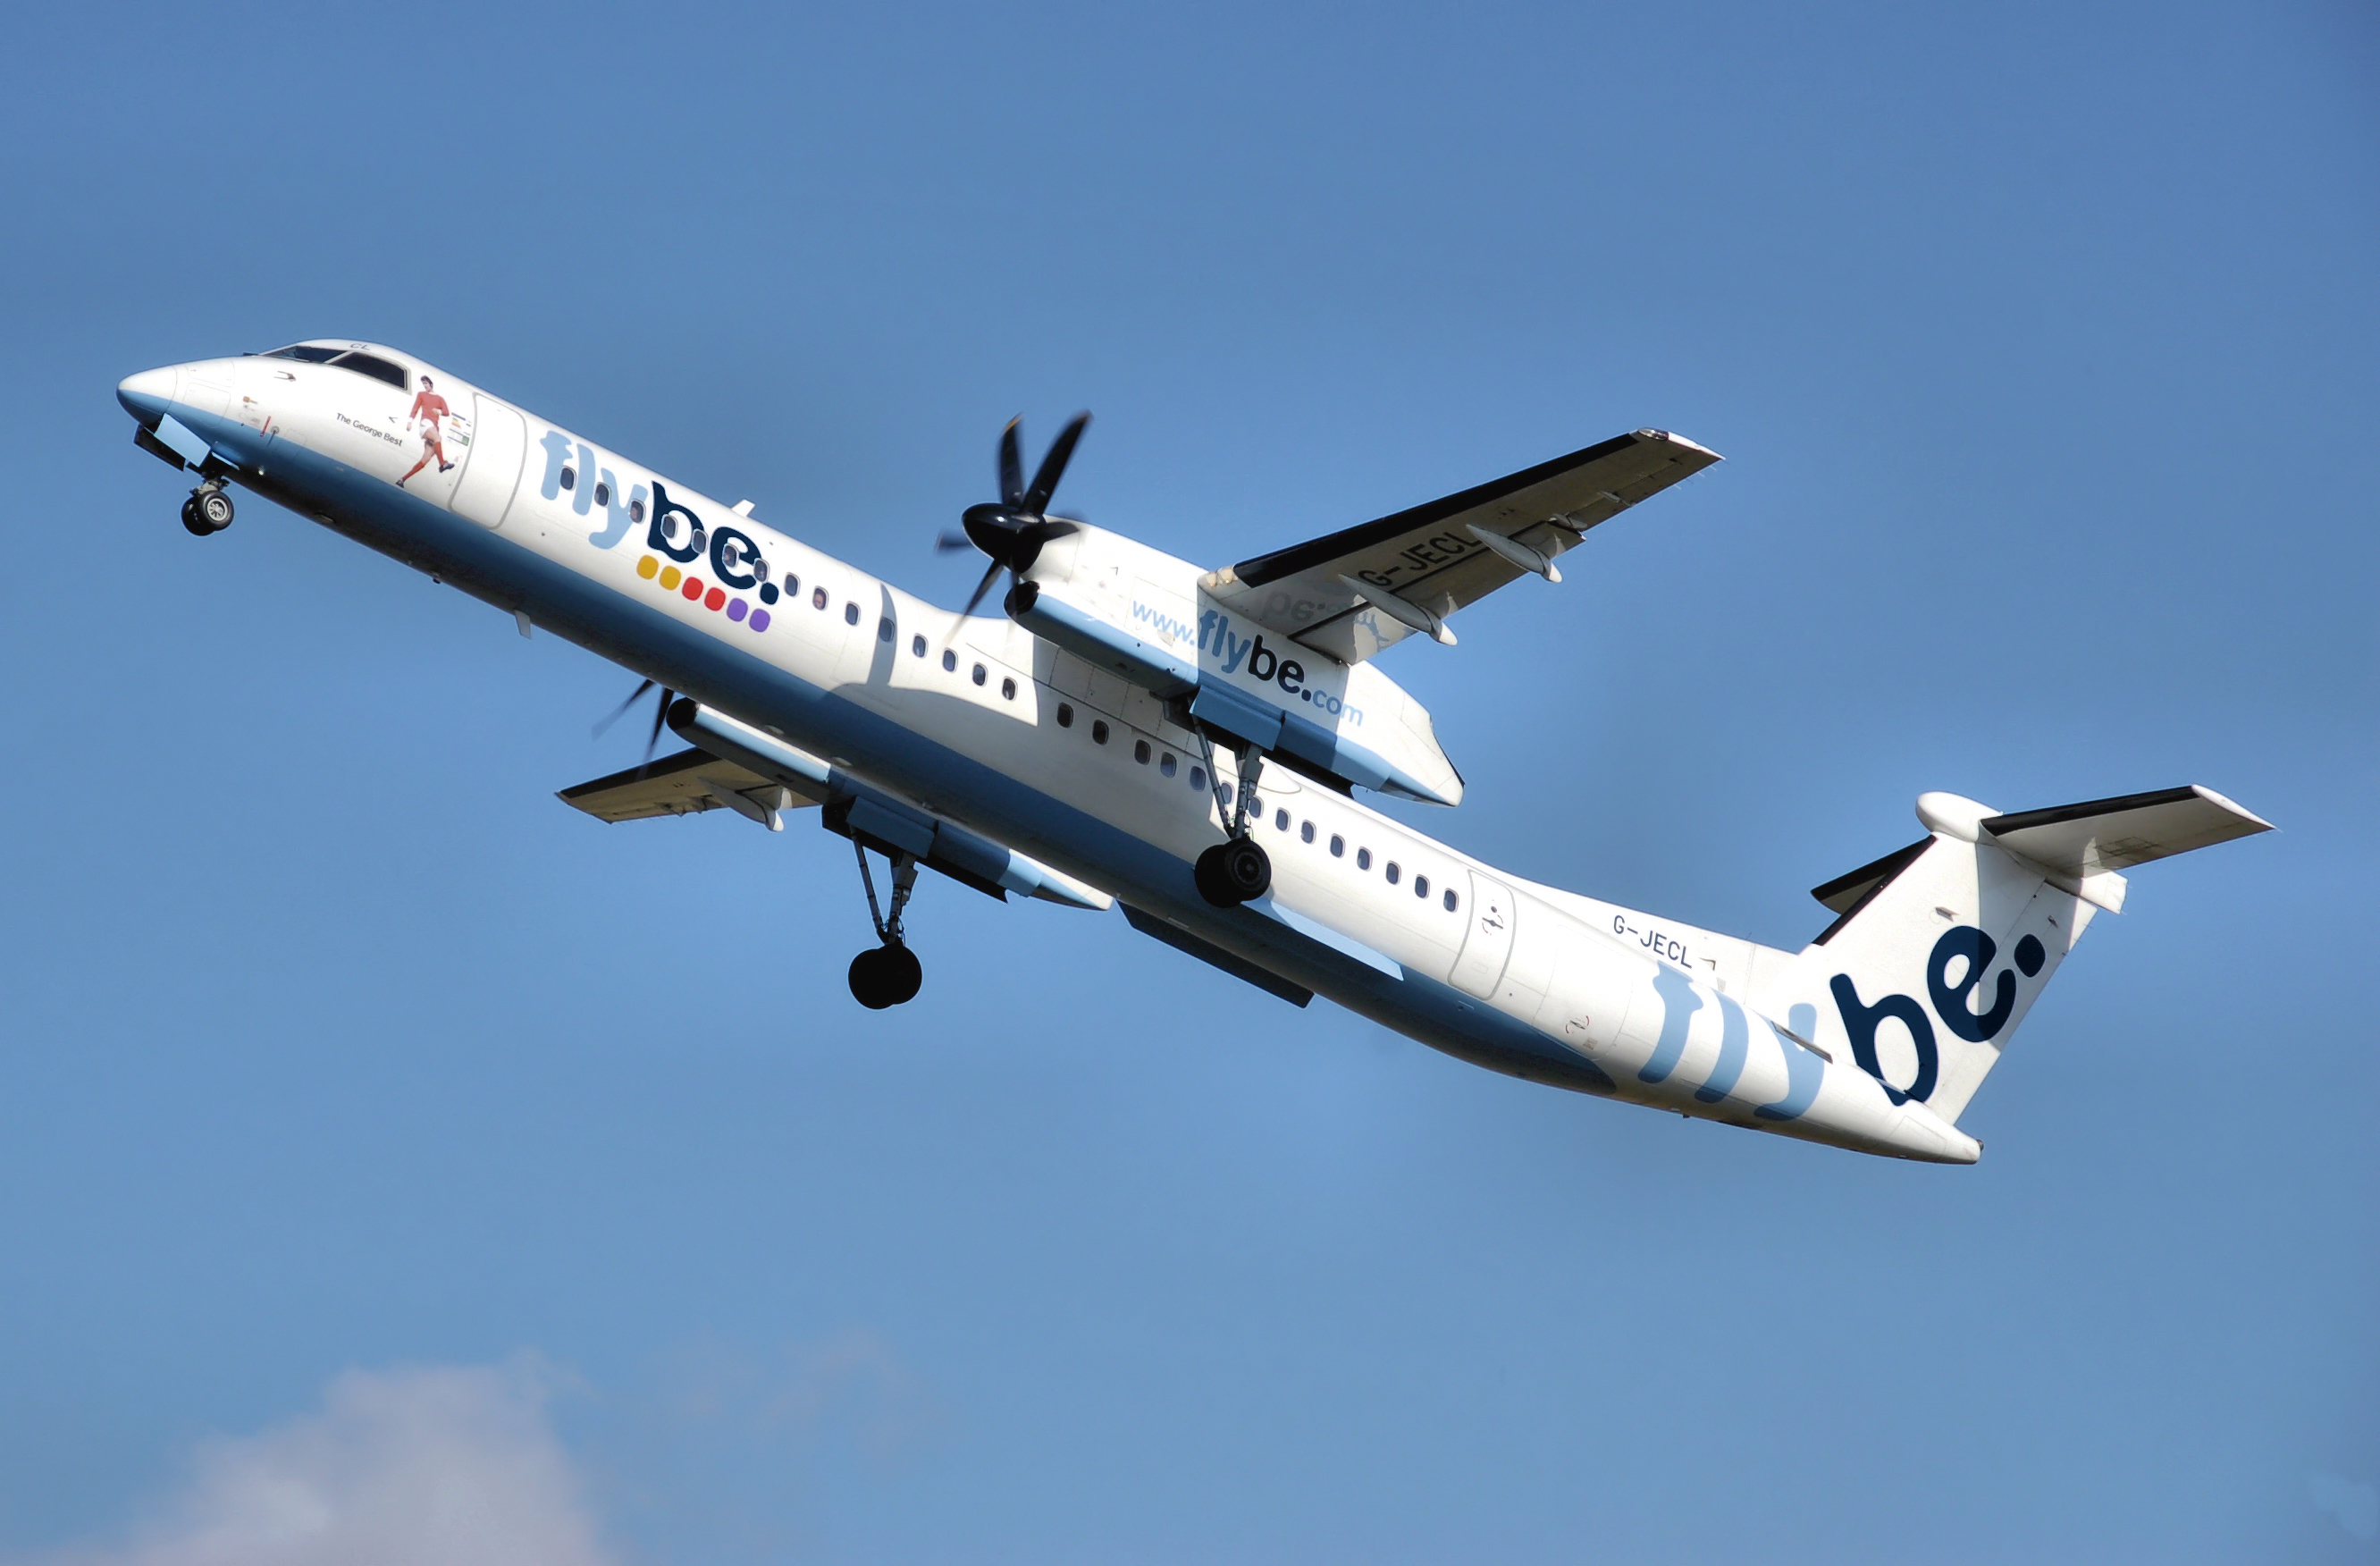 Bombardied Dash 8 Q400